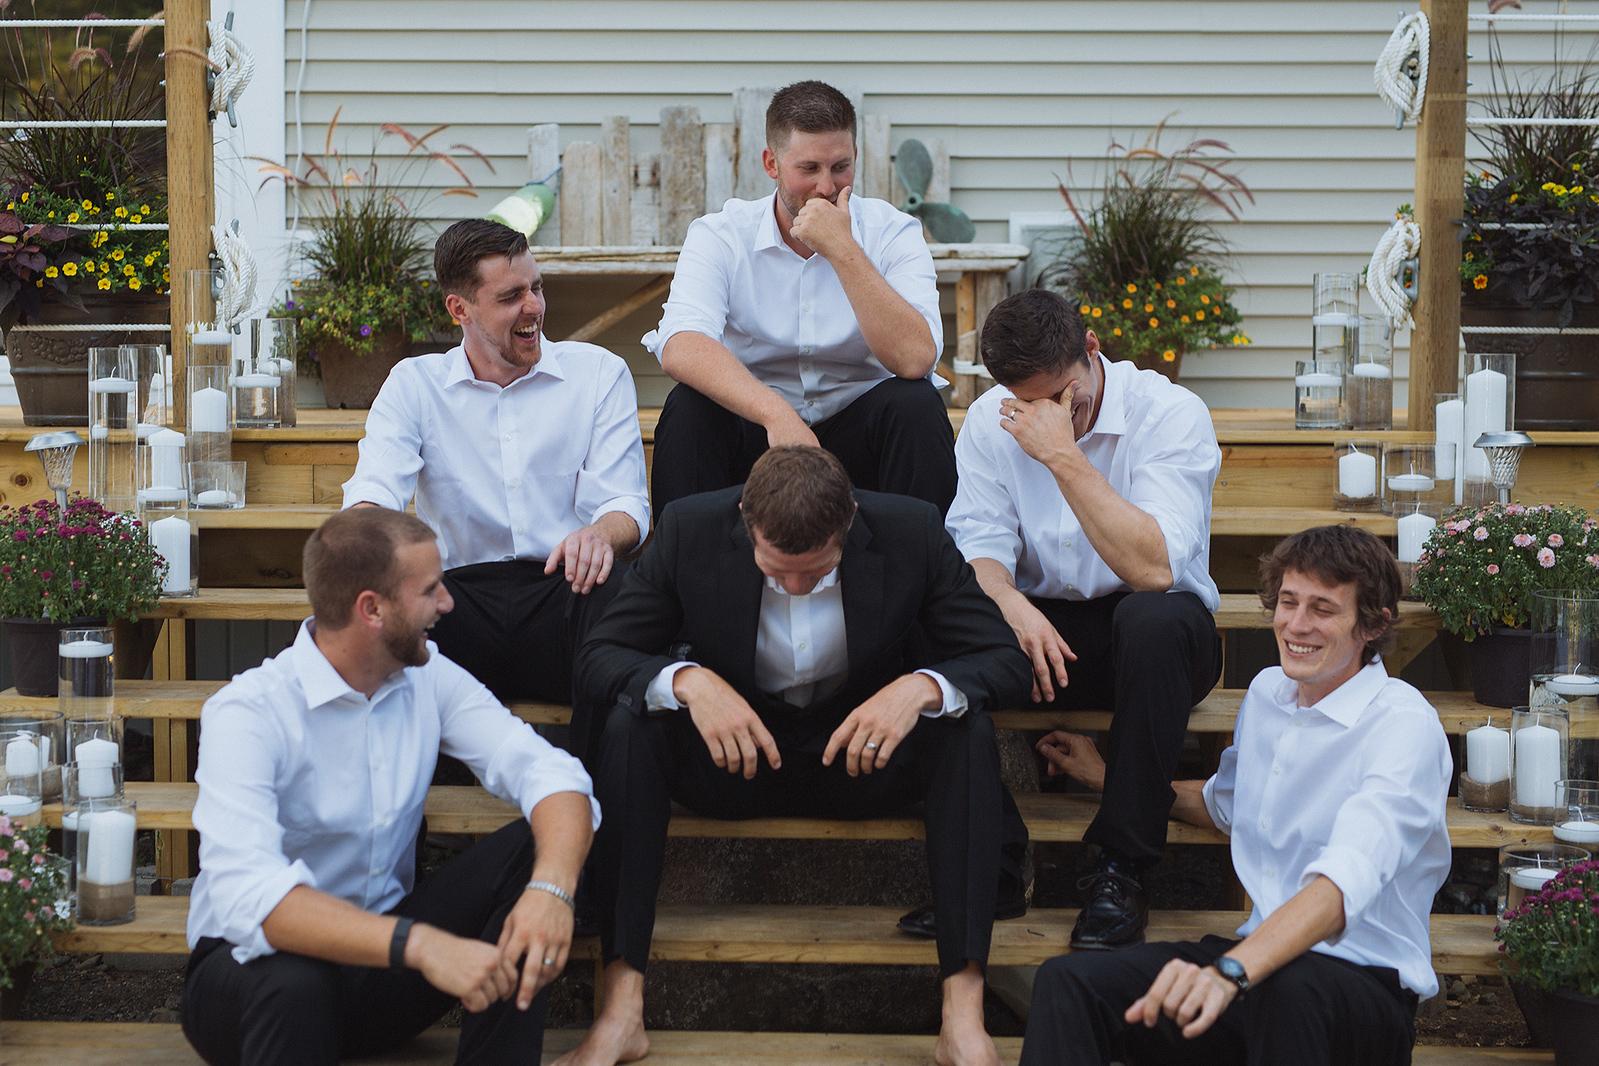 Groomsmen laughs